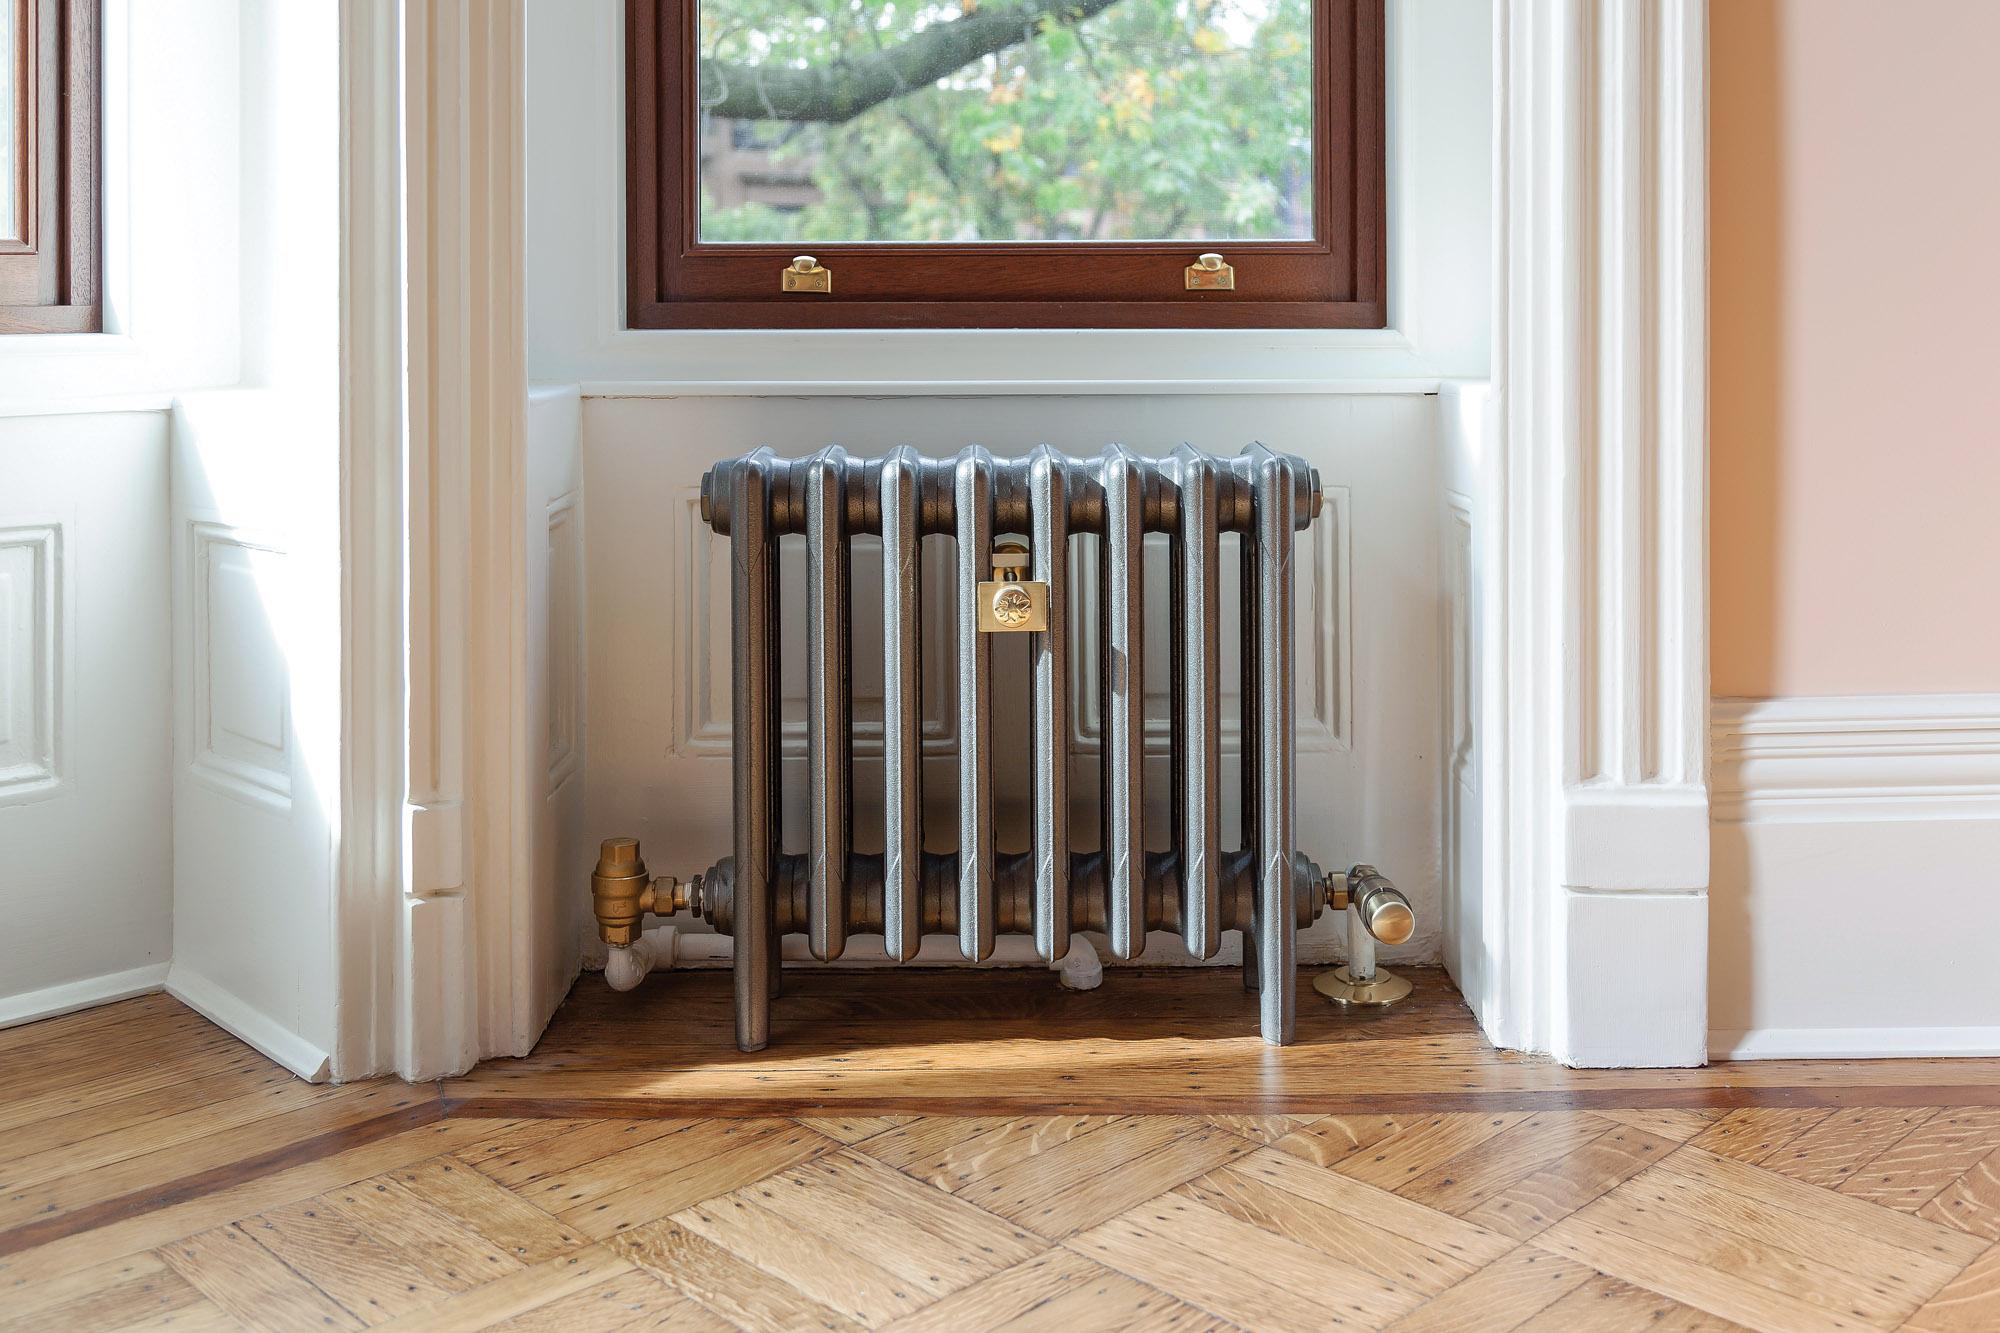 Castrad's 'Mercury' radiator